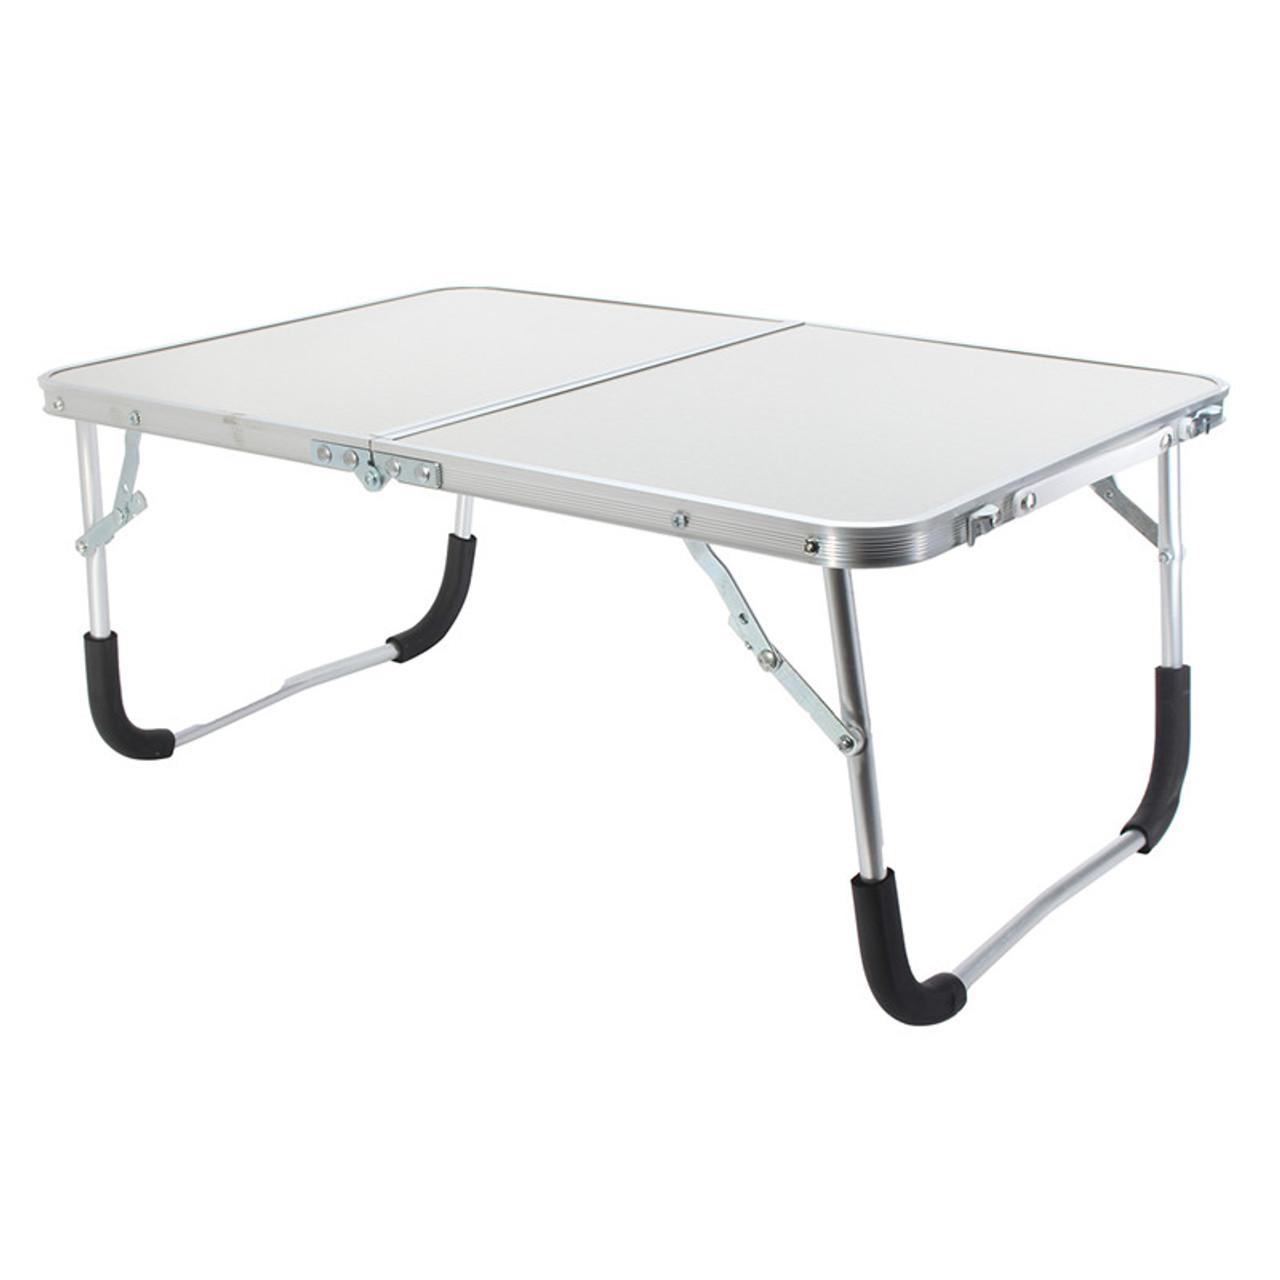 new laptop stand holder lap desk portable laptop desk folding table